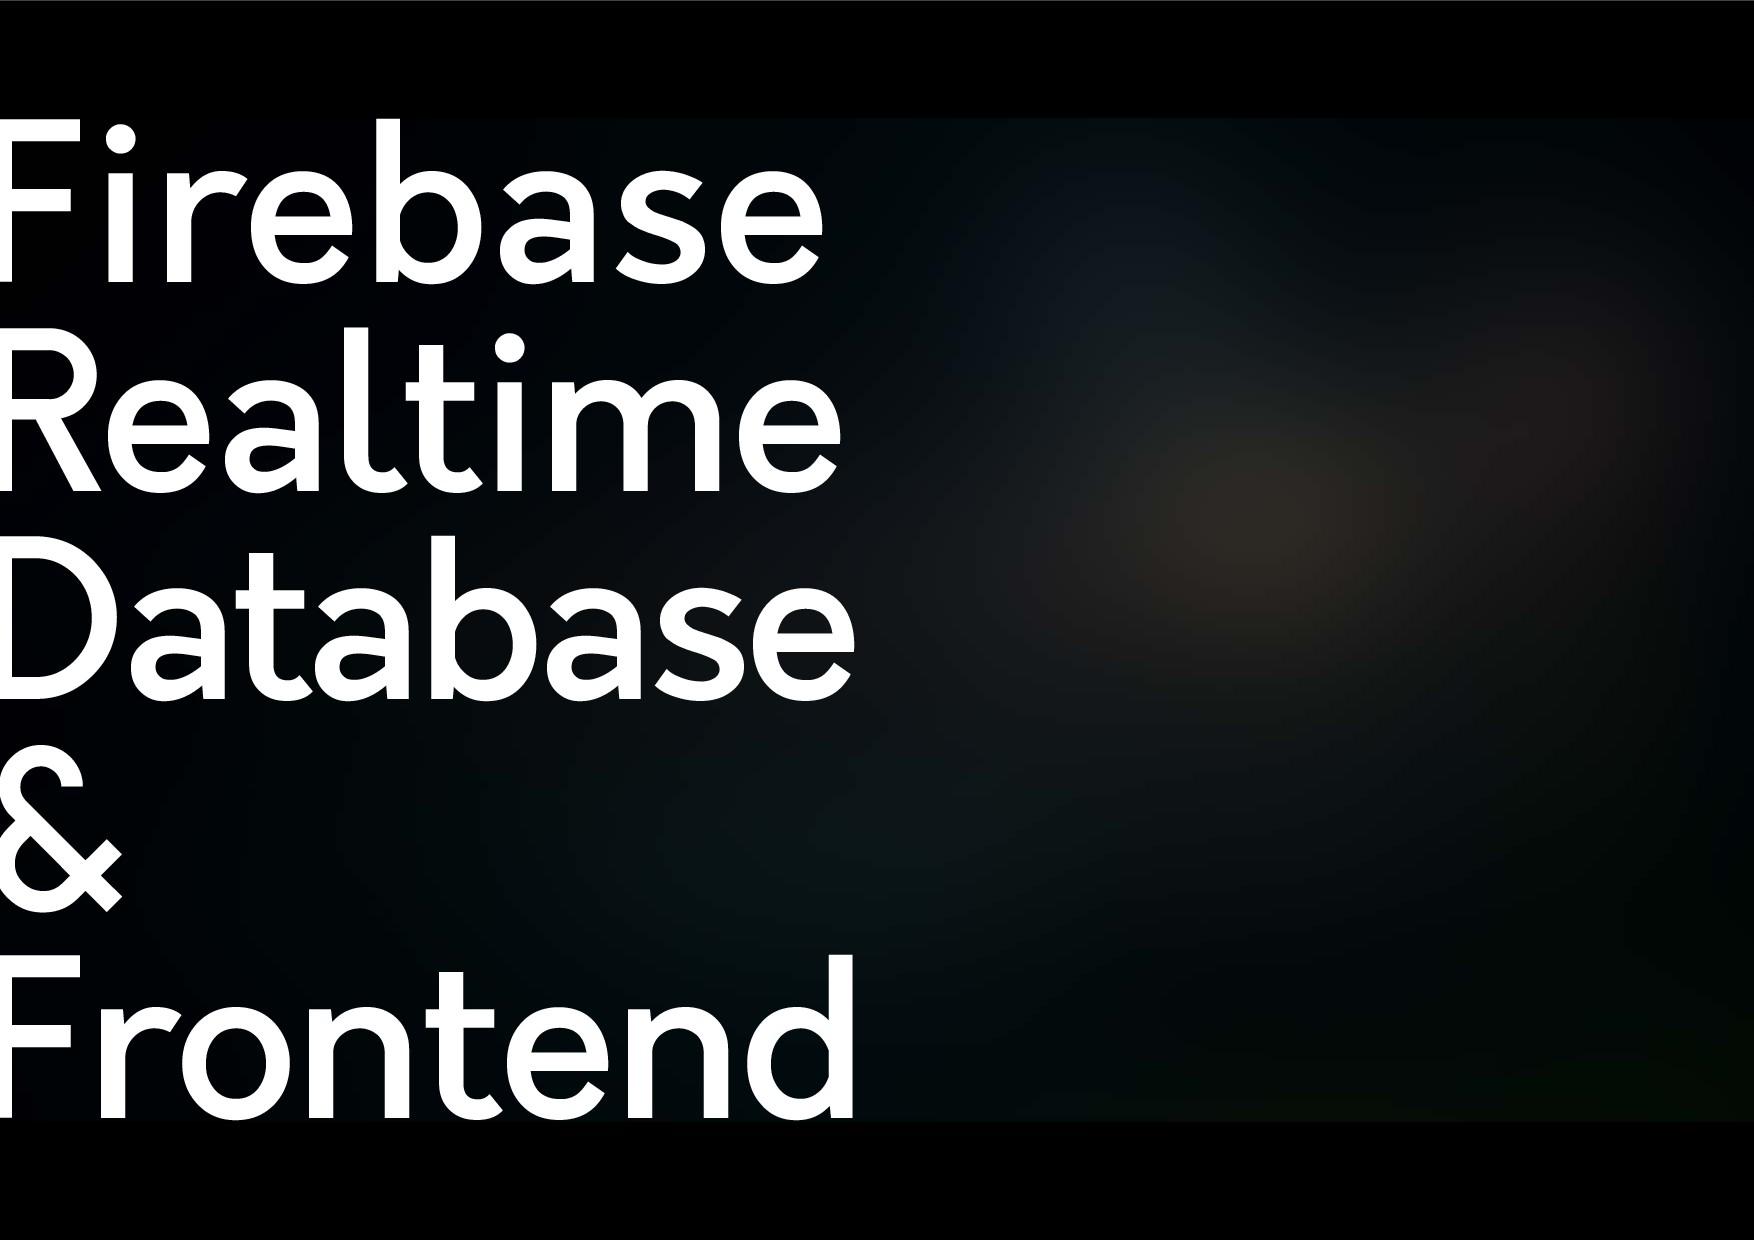 Firebase Realtime Database & Frontend